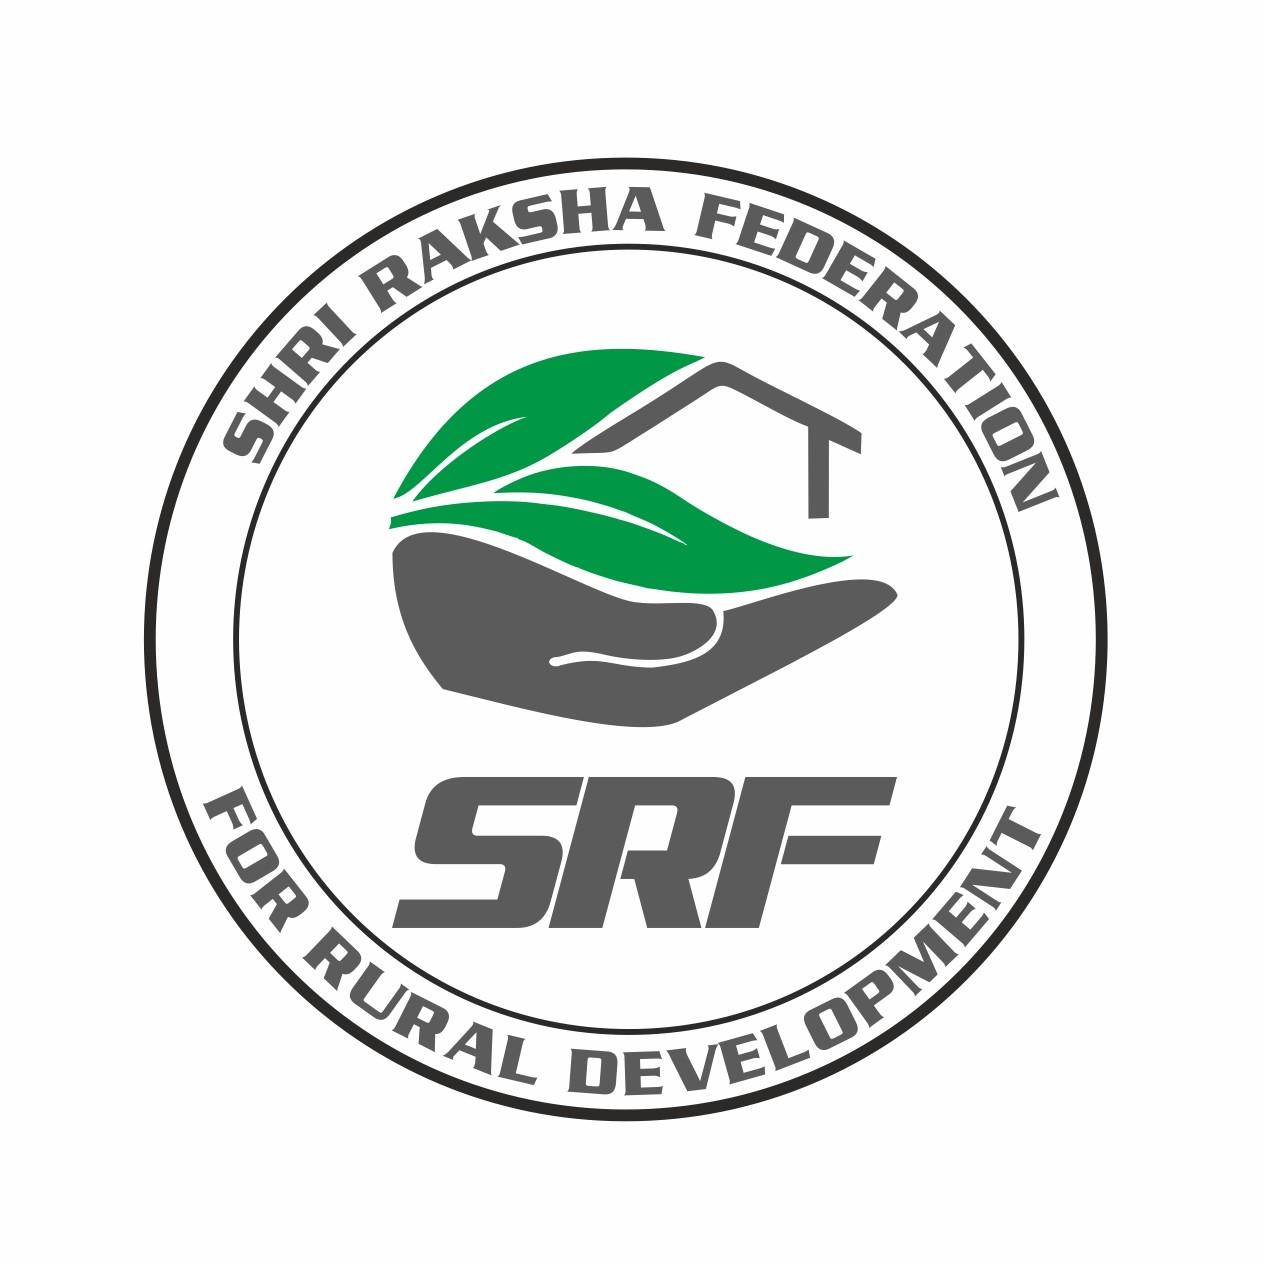 /media/shriraksha/1NGO-00350-Shri_Raksha_Federation_For_Rural_Development-Logo.jpg